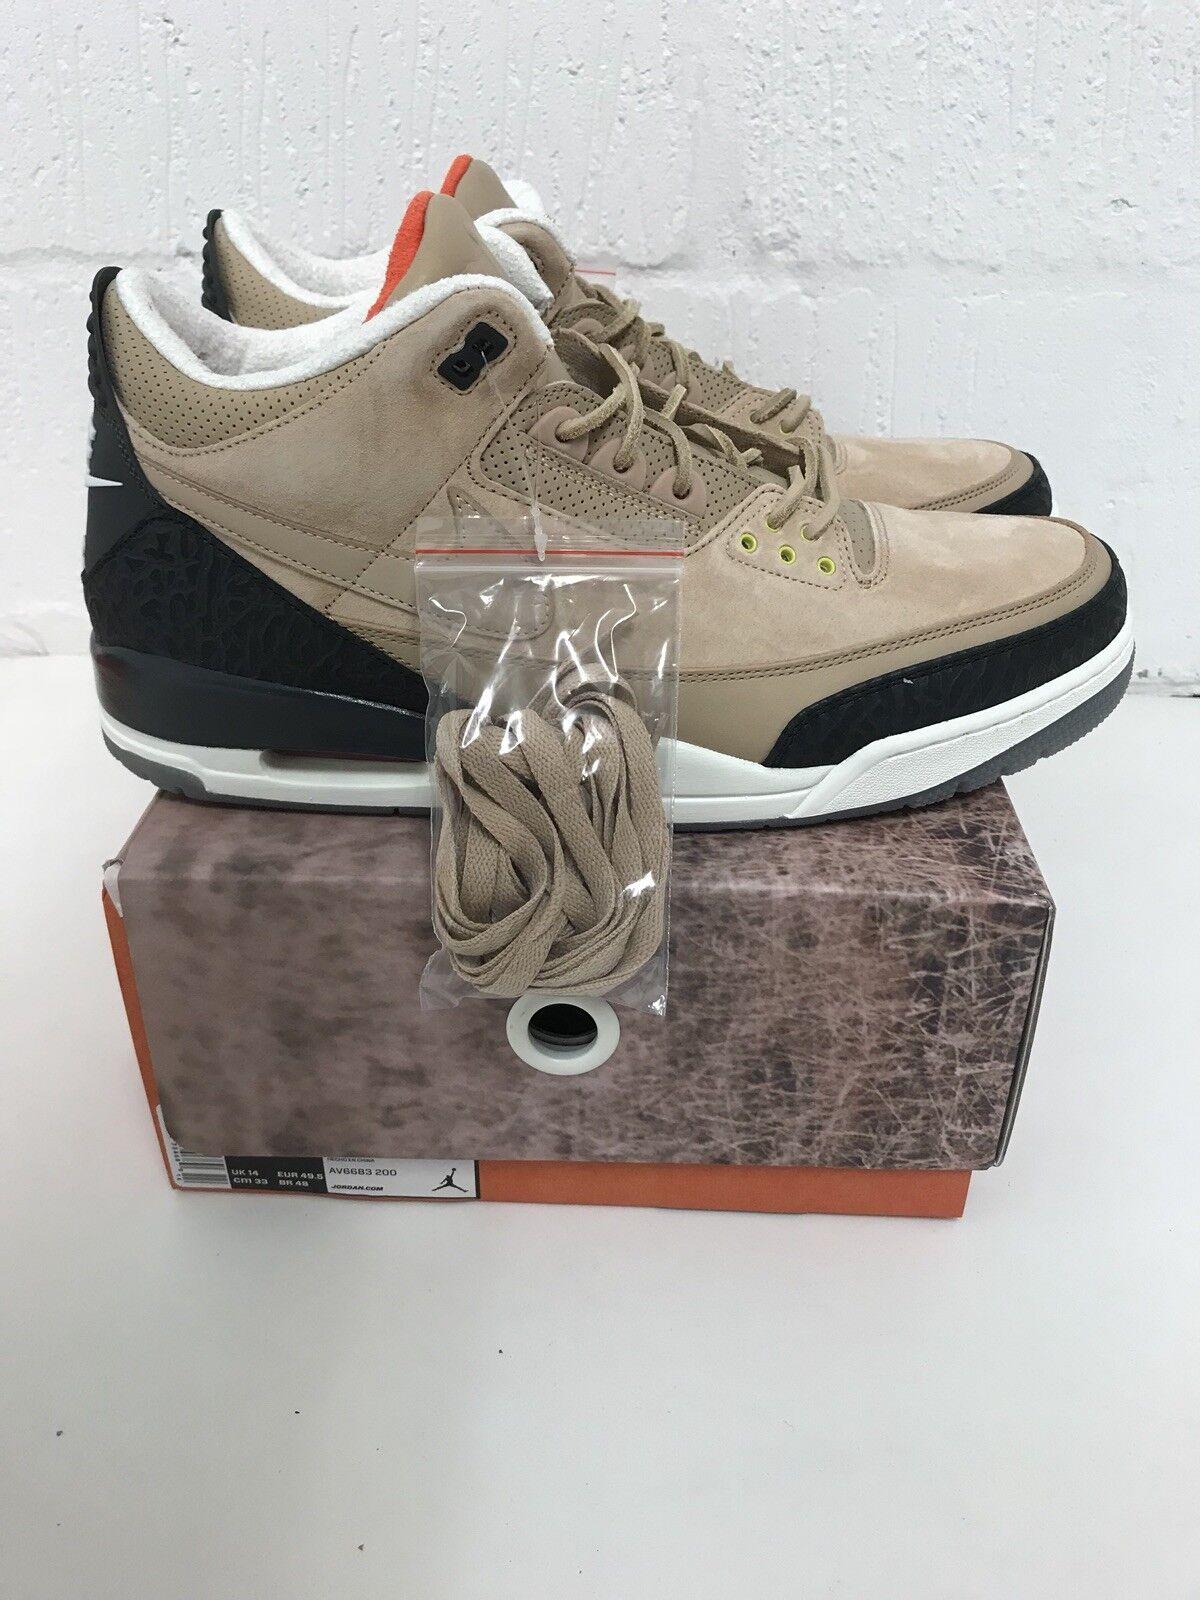 Air Jordan Nike AJ 3 NRG JTH Justin Timberlake  Beige US 15 AV6683-200